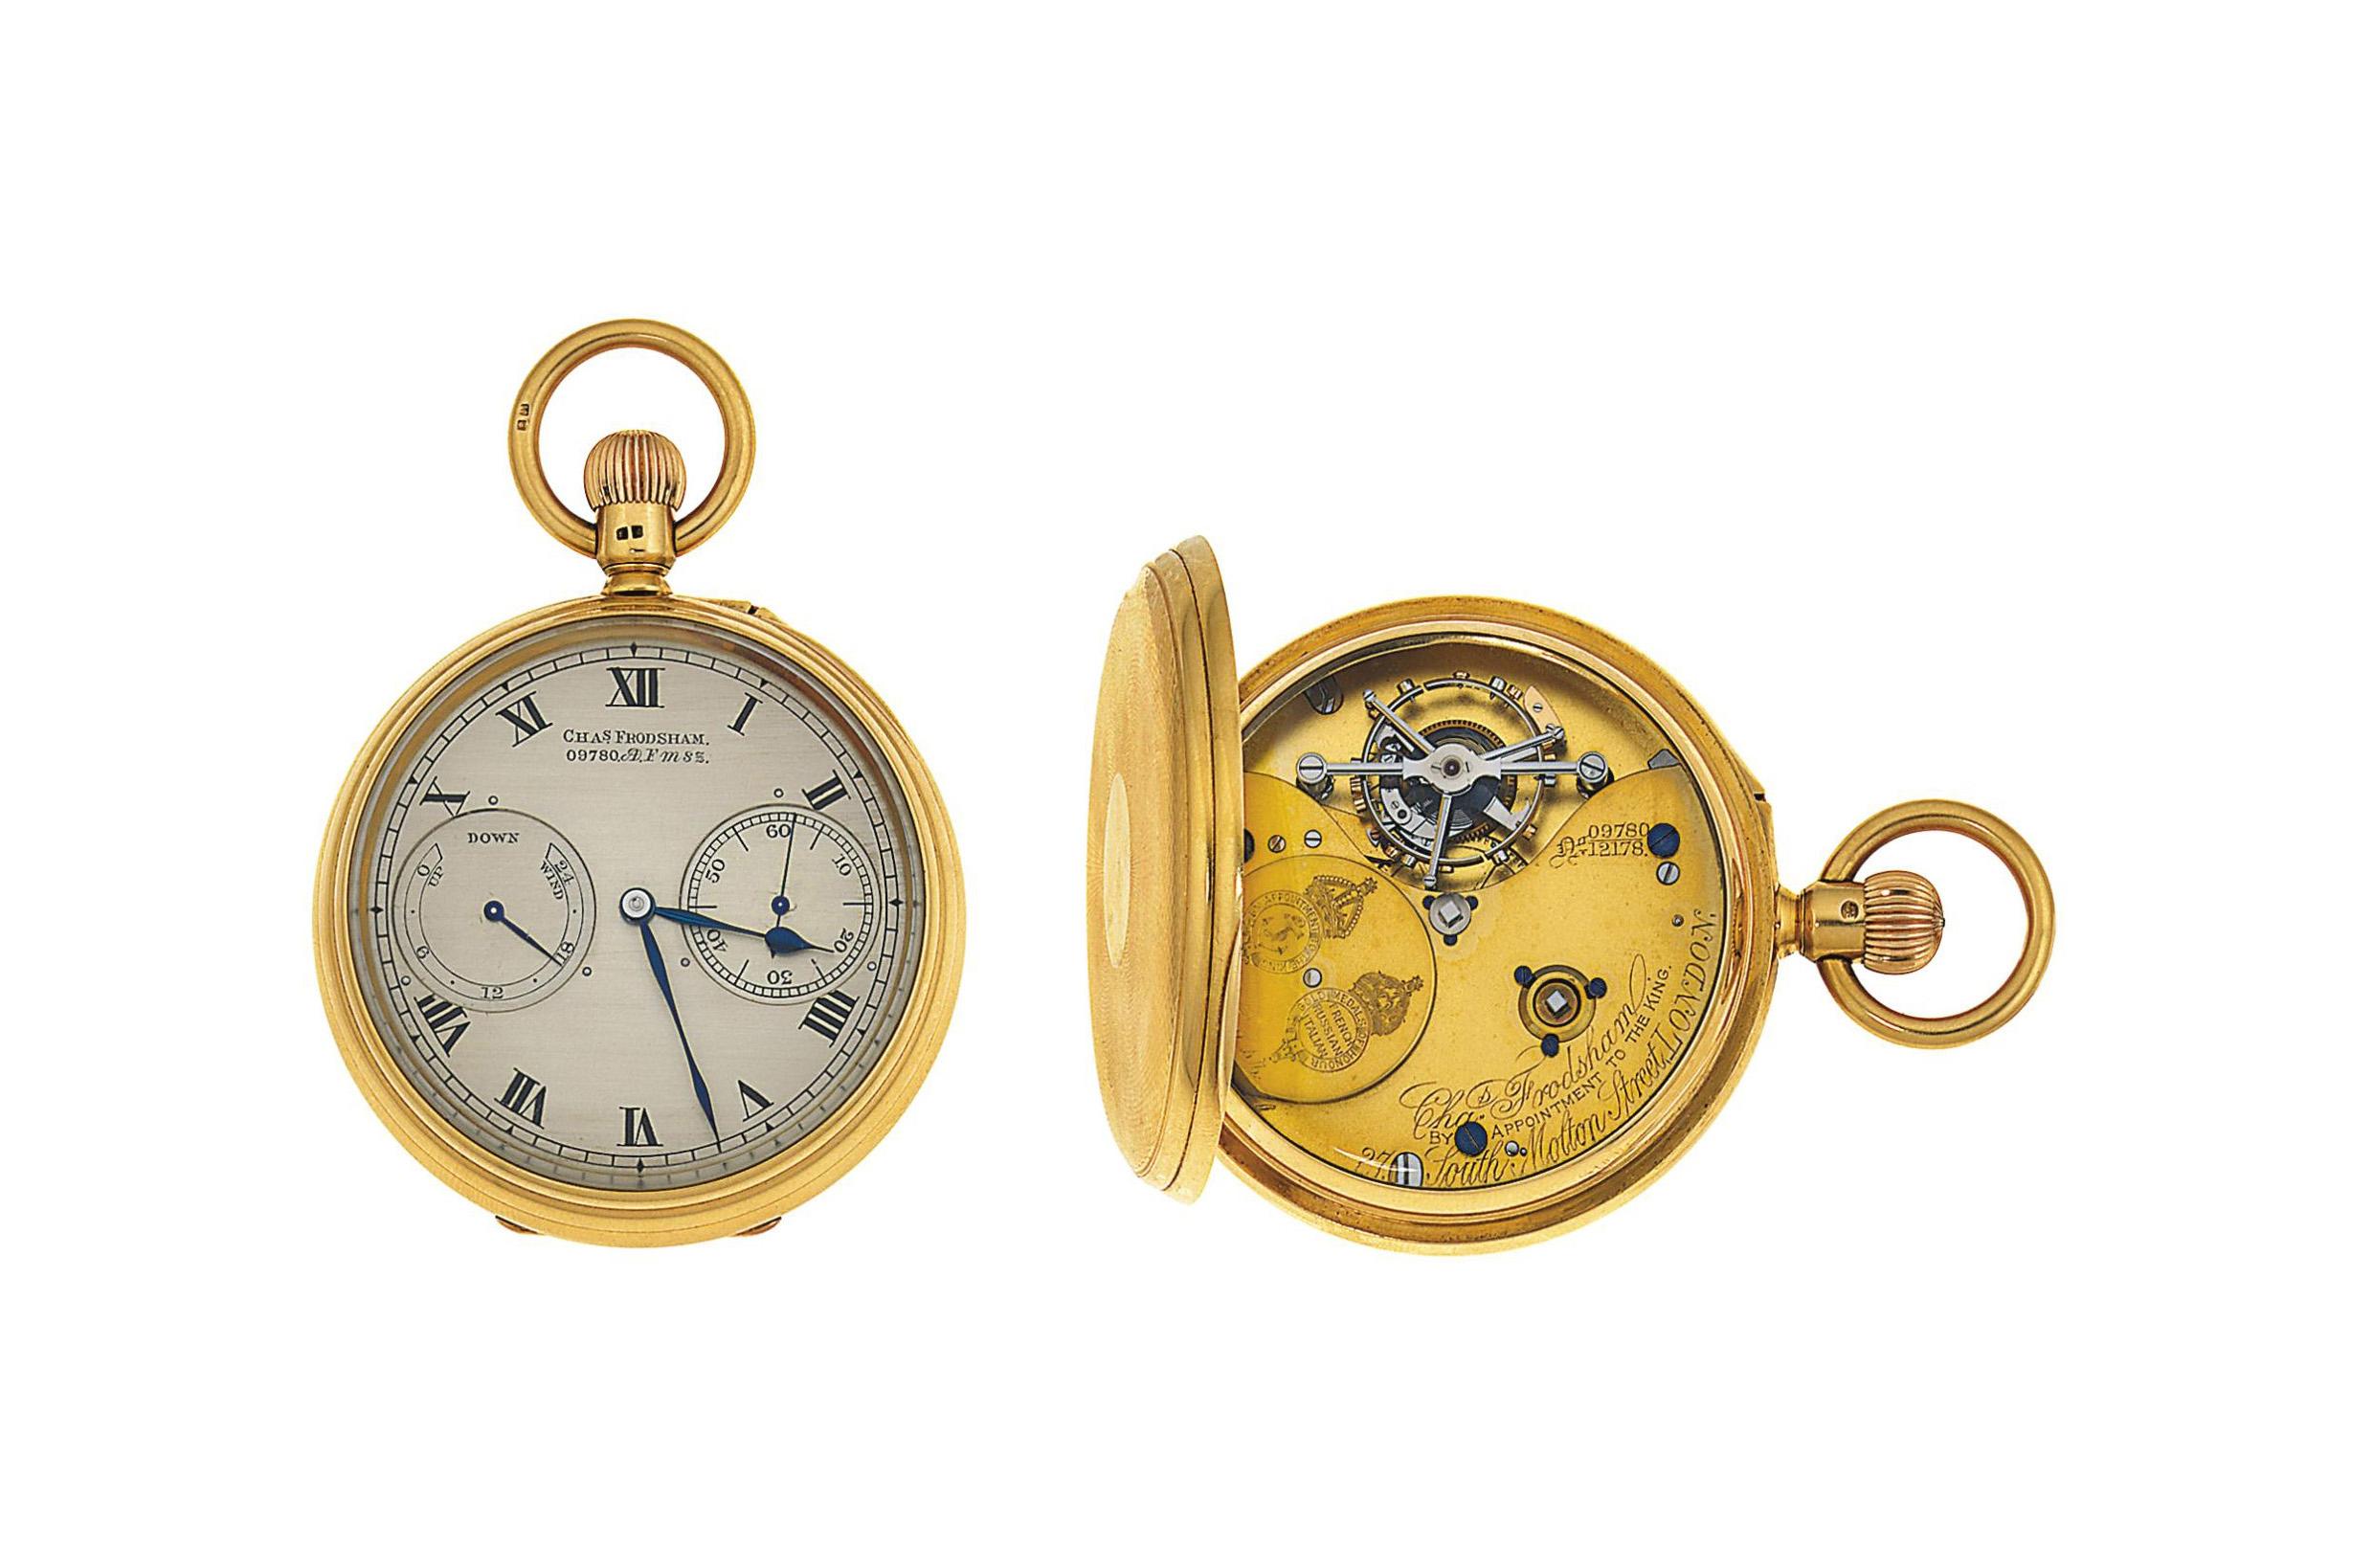 An 18ct. gold tourbillon keyless open face pocket watch, by Charles Frodsham